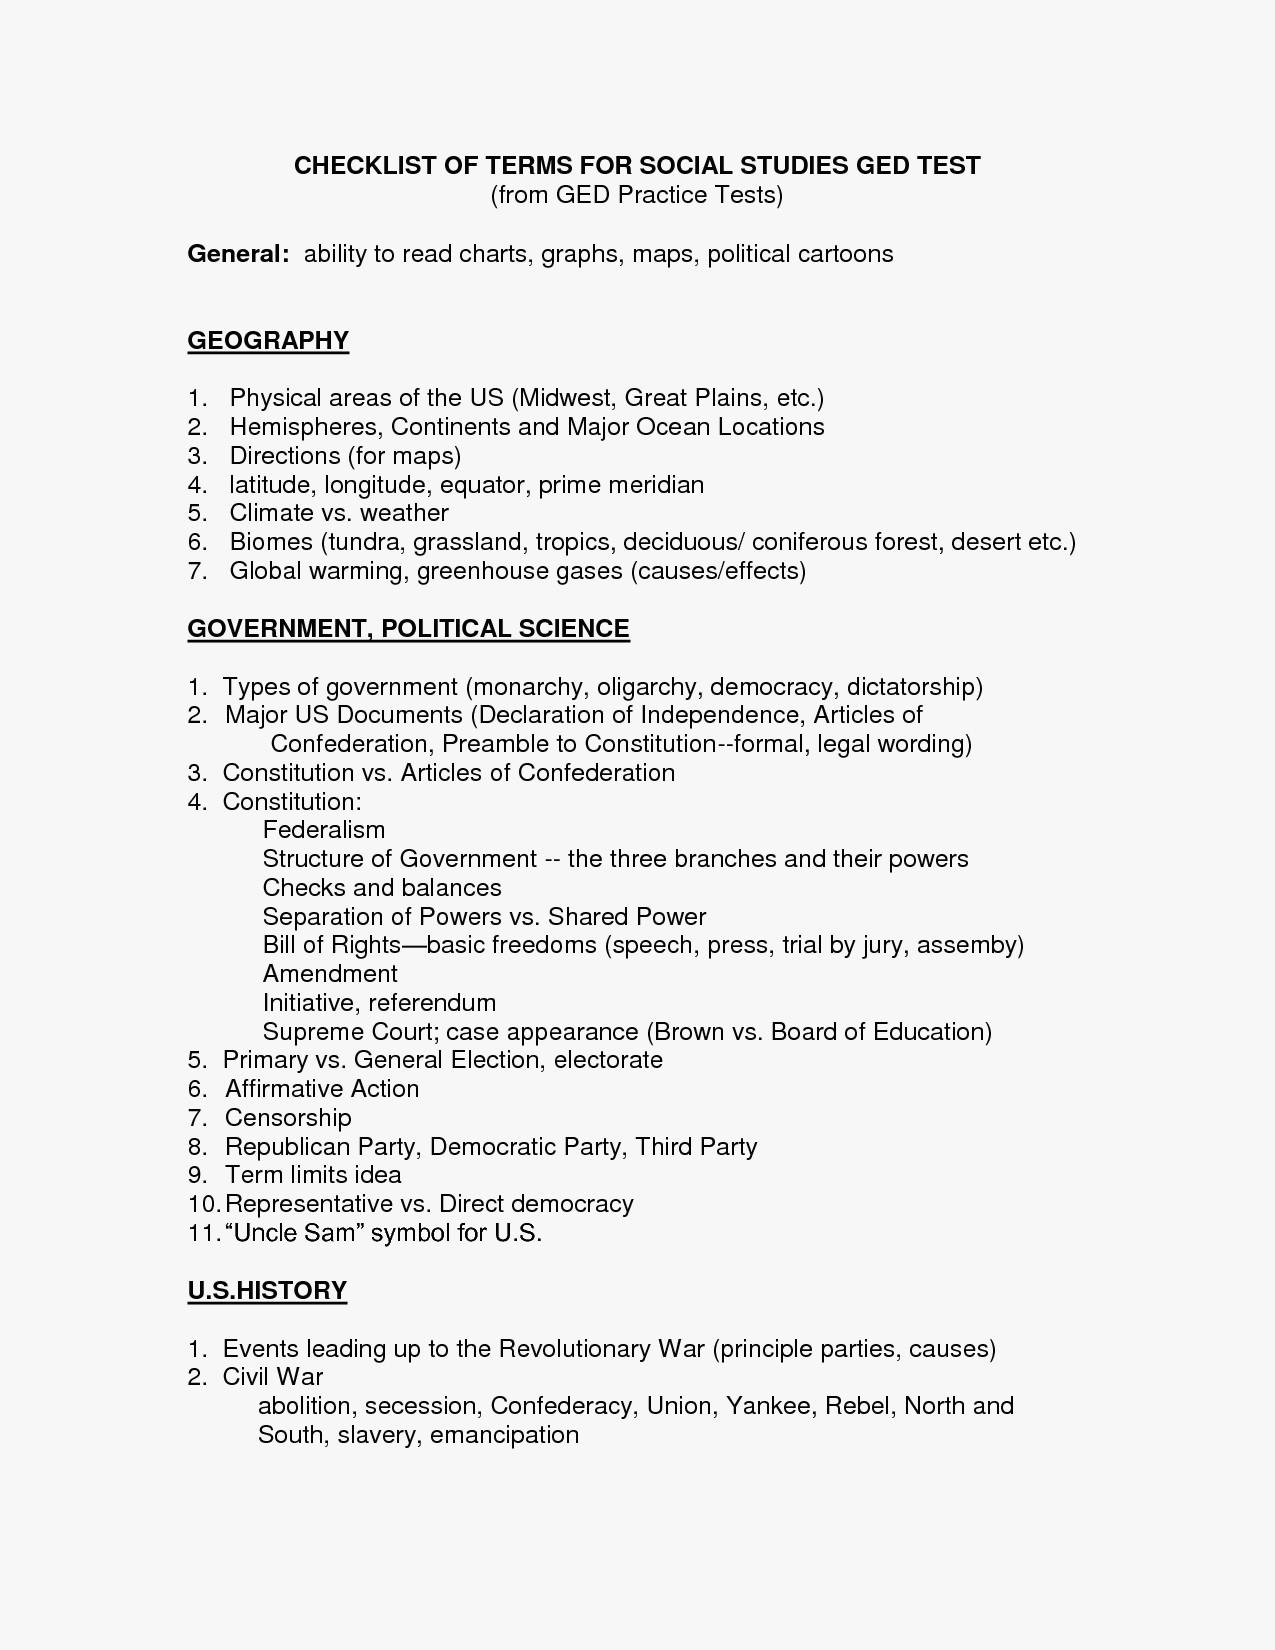 Free Printable Ged Math Worksheets Ged Tasc Class - Classy World - Free Printable Ged Science Worksheets